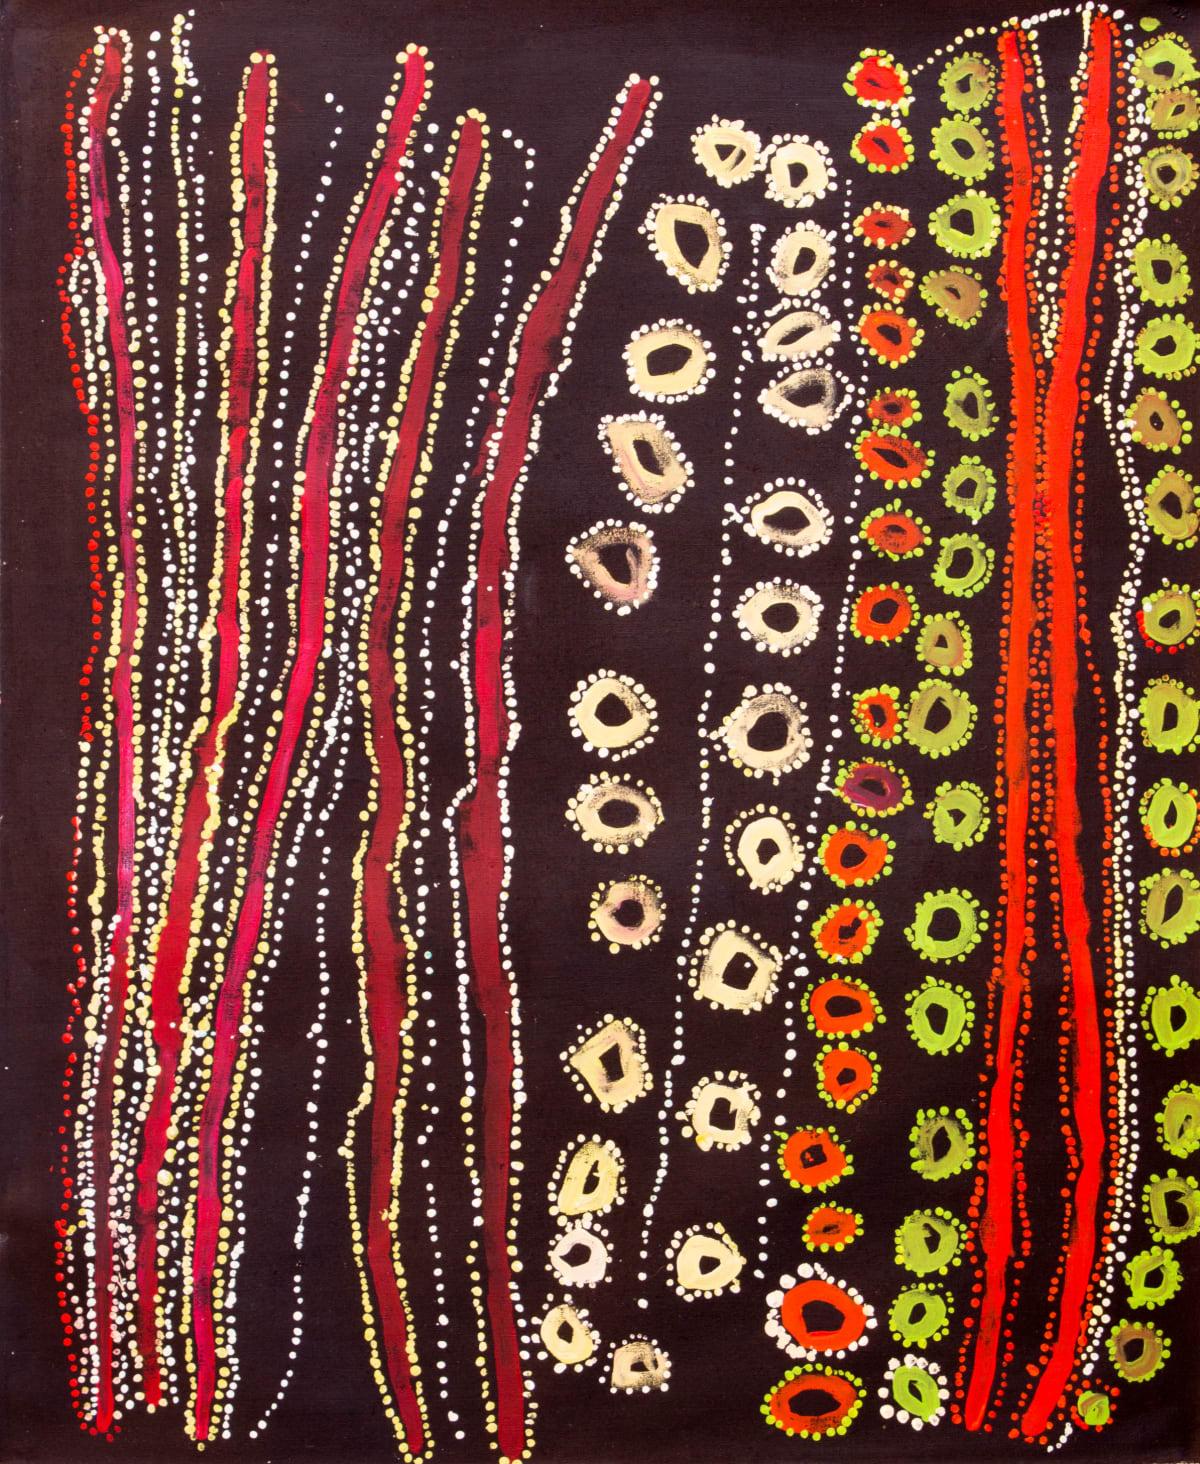 Lawrence Pennington Wati Kutjara acrylic on linen 110 x 91 cm